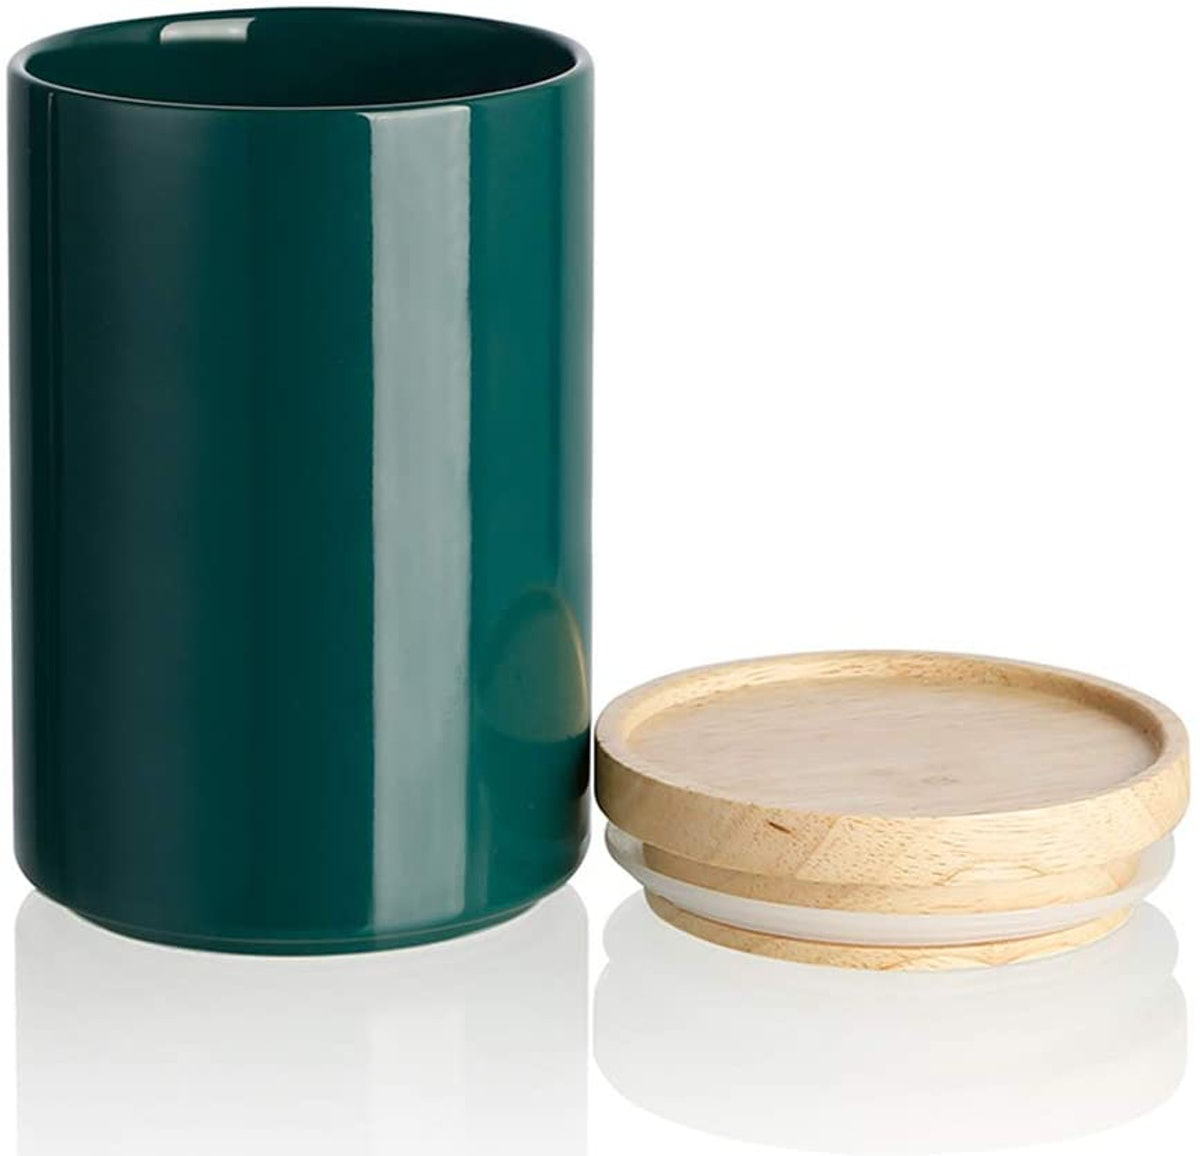 SWEEJAR Ceramic Kitchen Canister, 1 qt.